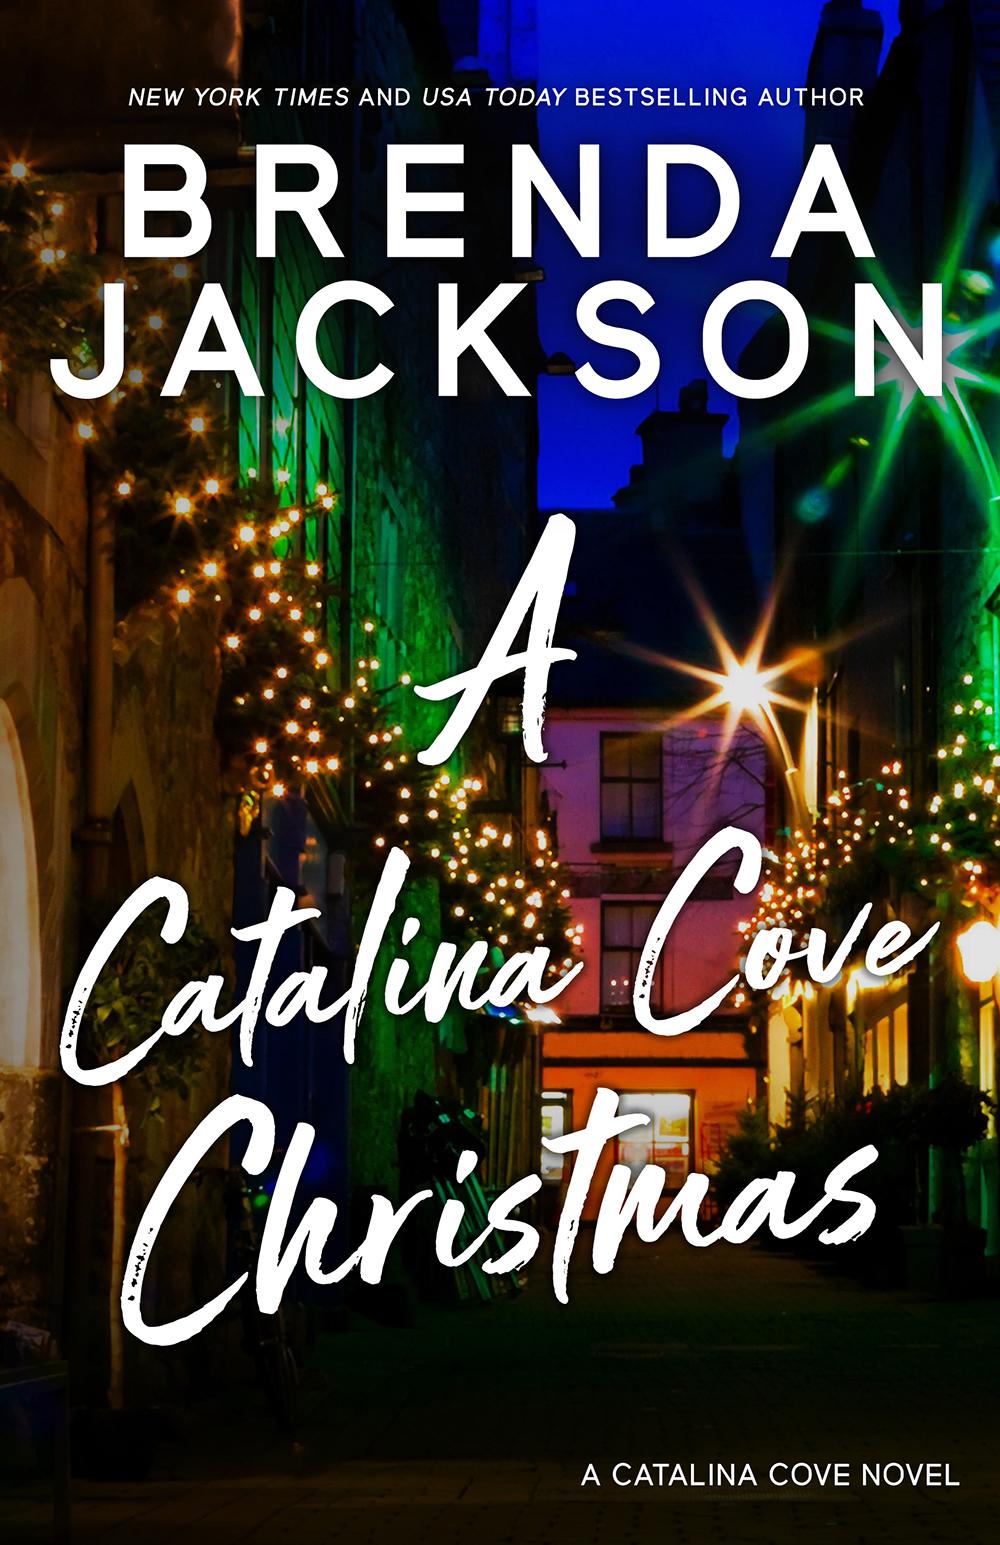 A Catalina Cove Christmas